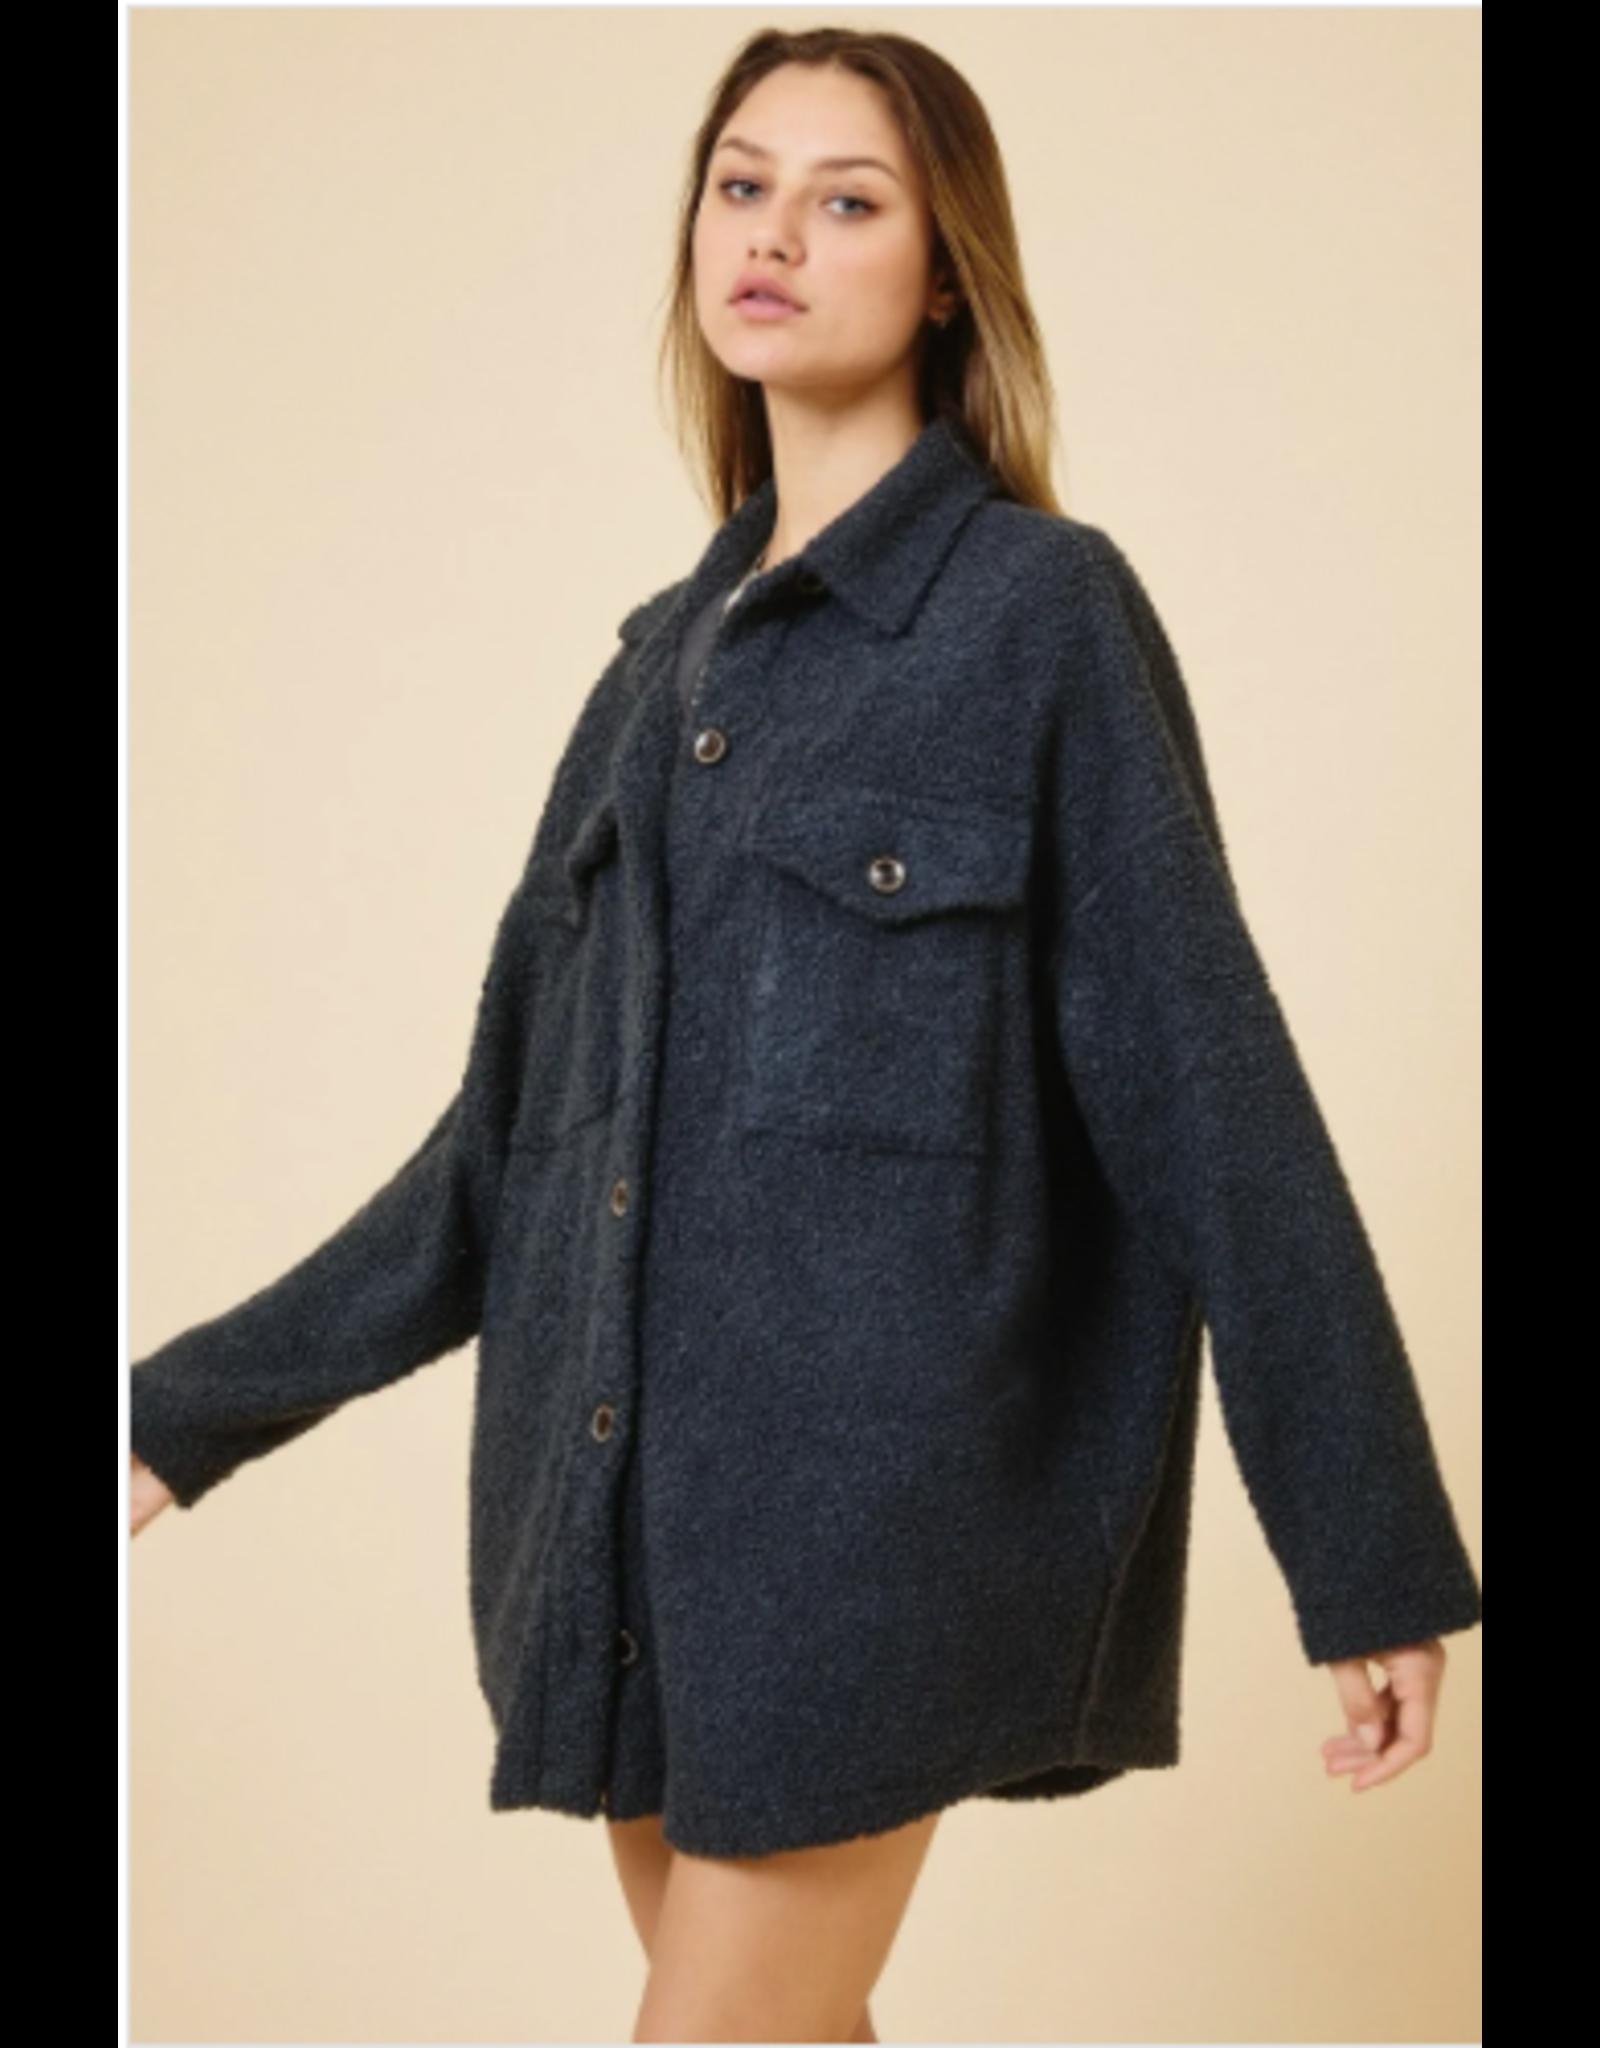 Oakley - Teddy bear shirt jacket (charcoal)